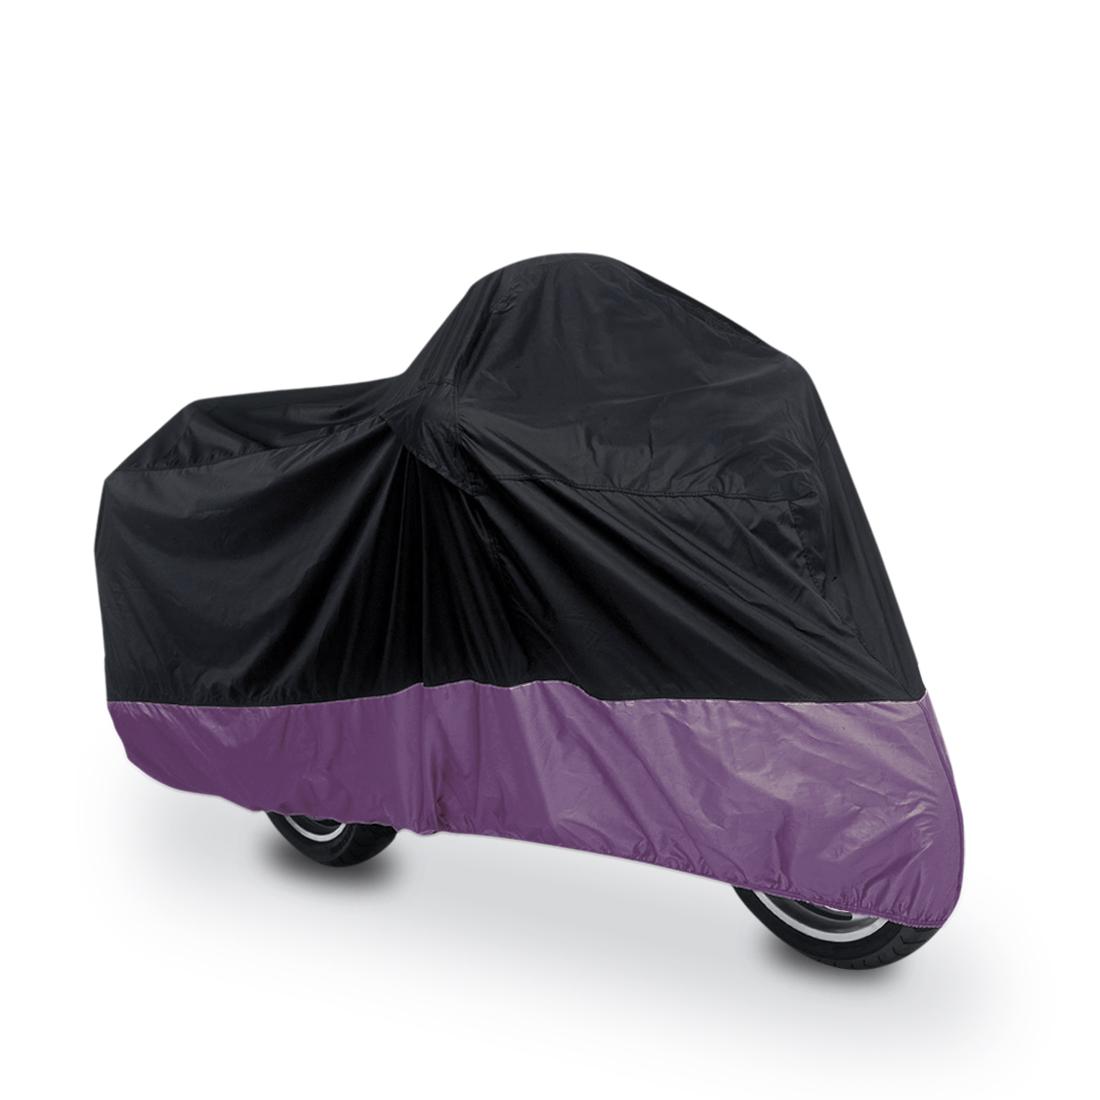 XXL 180T Rain Dust Motorcycle Cover Black+Purple Outdoor Waterproof UV Protector